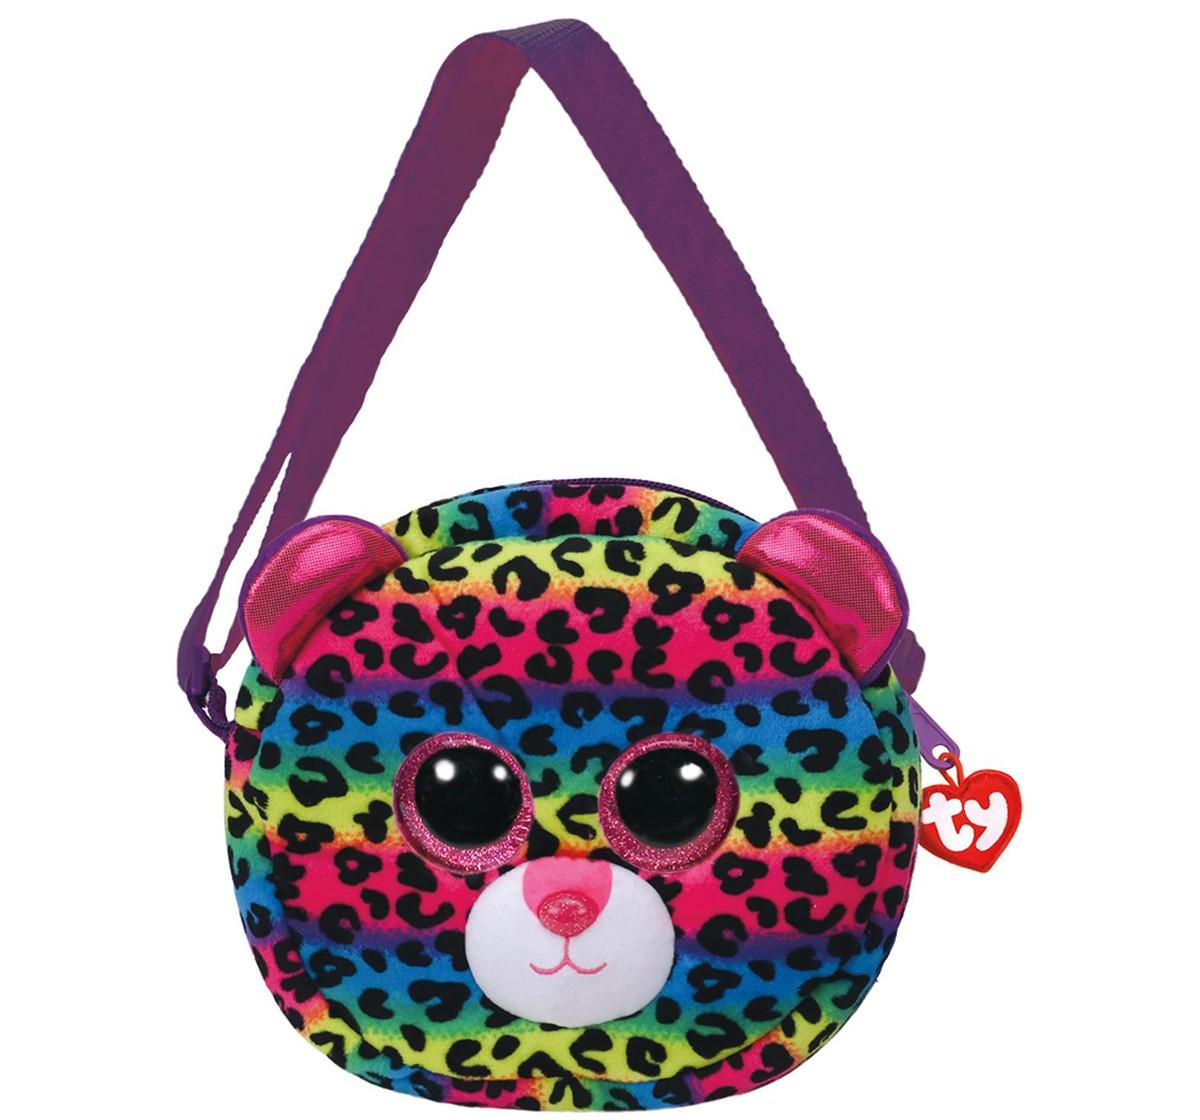 Ty DOTTY - Shoulder Bag Plush Accessories for Kids age 3Y+ - 15 Cm